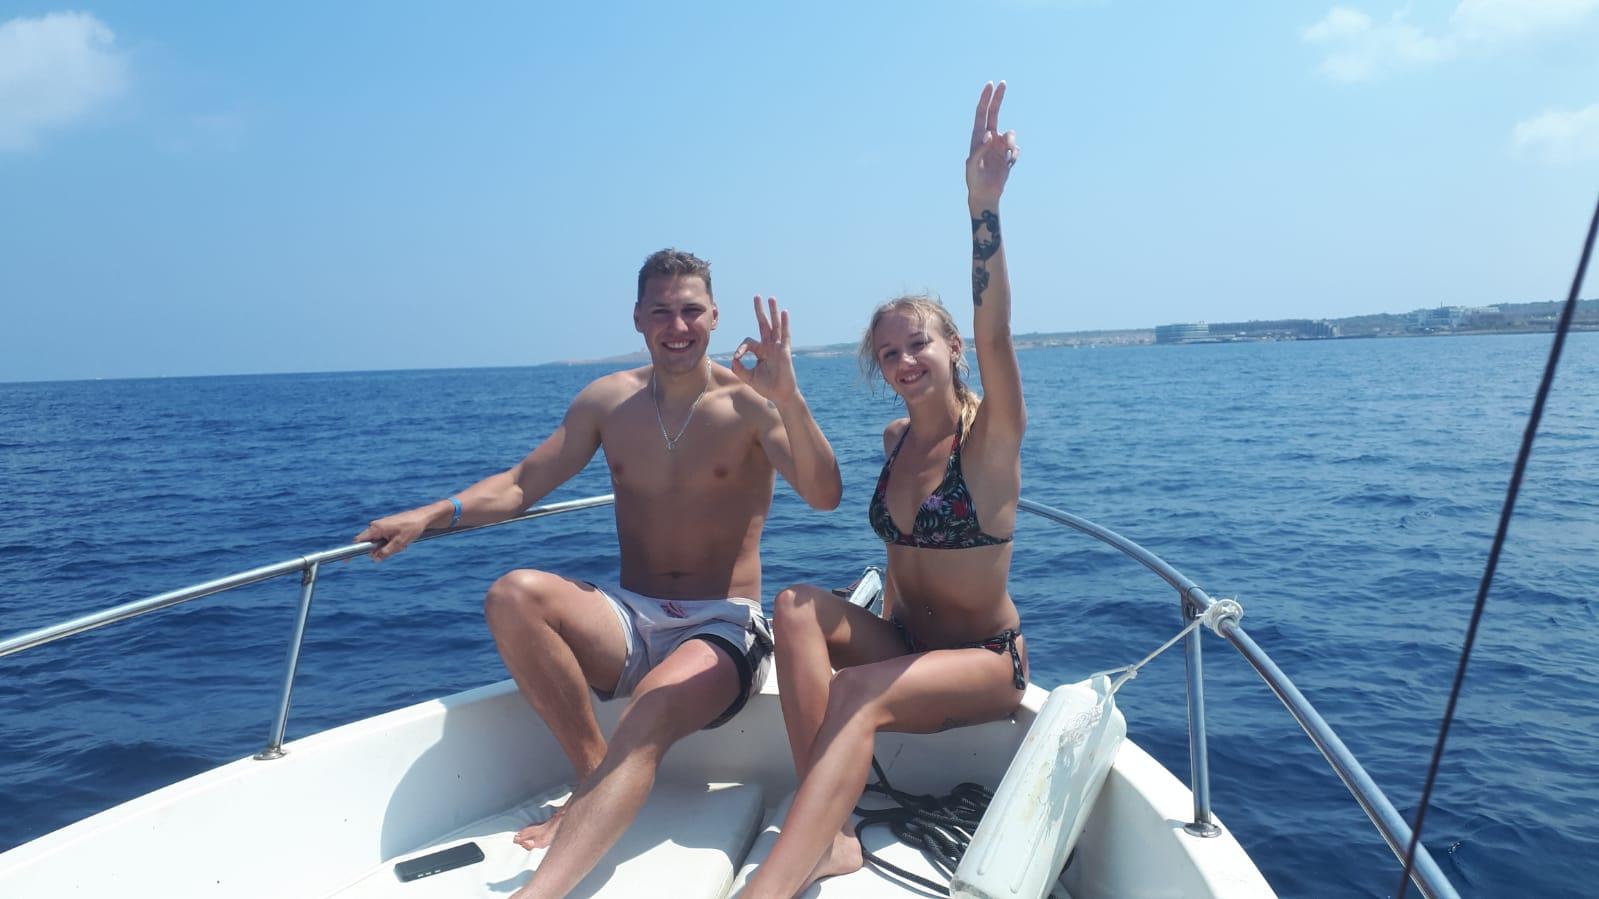 Outdoor explorers Malta Gozo Comino Boat tour trip